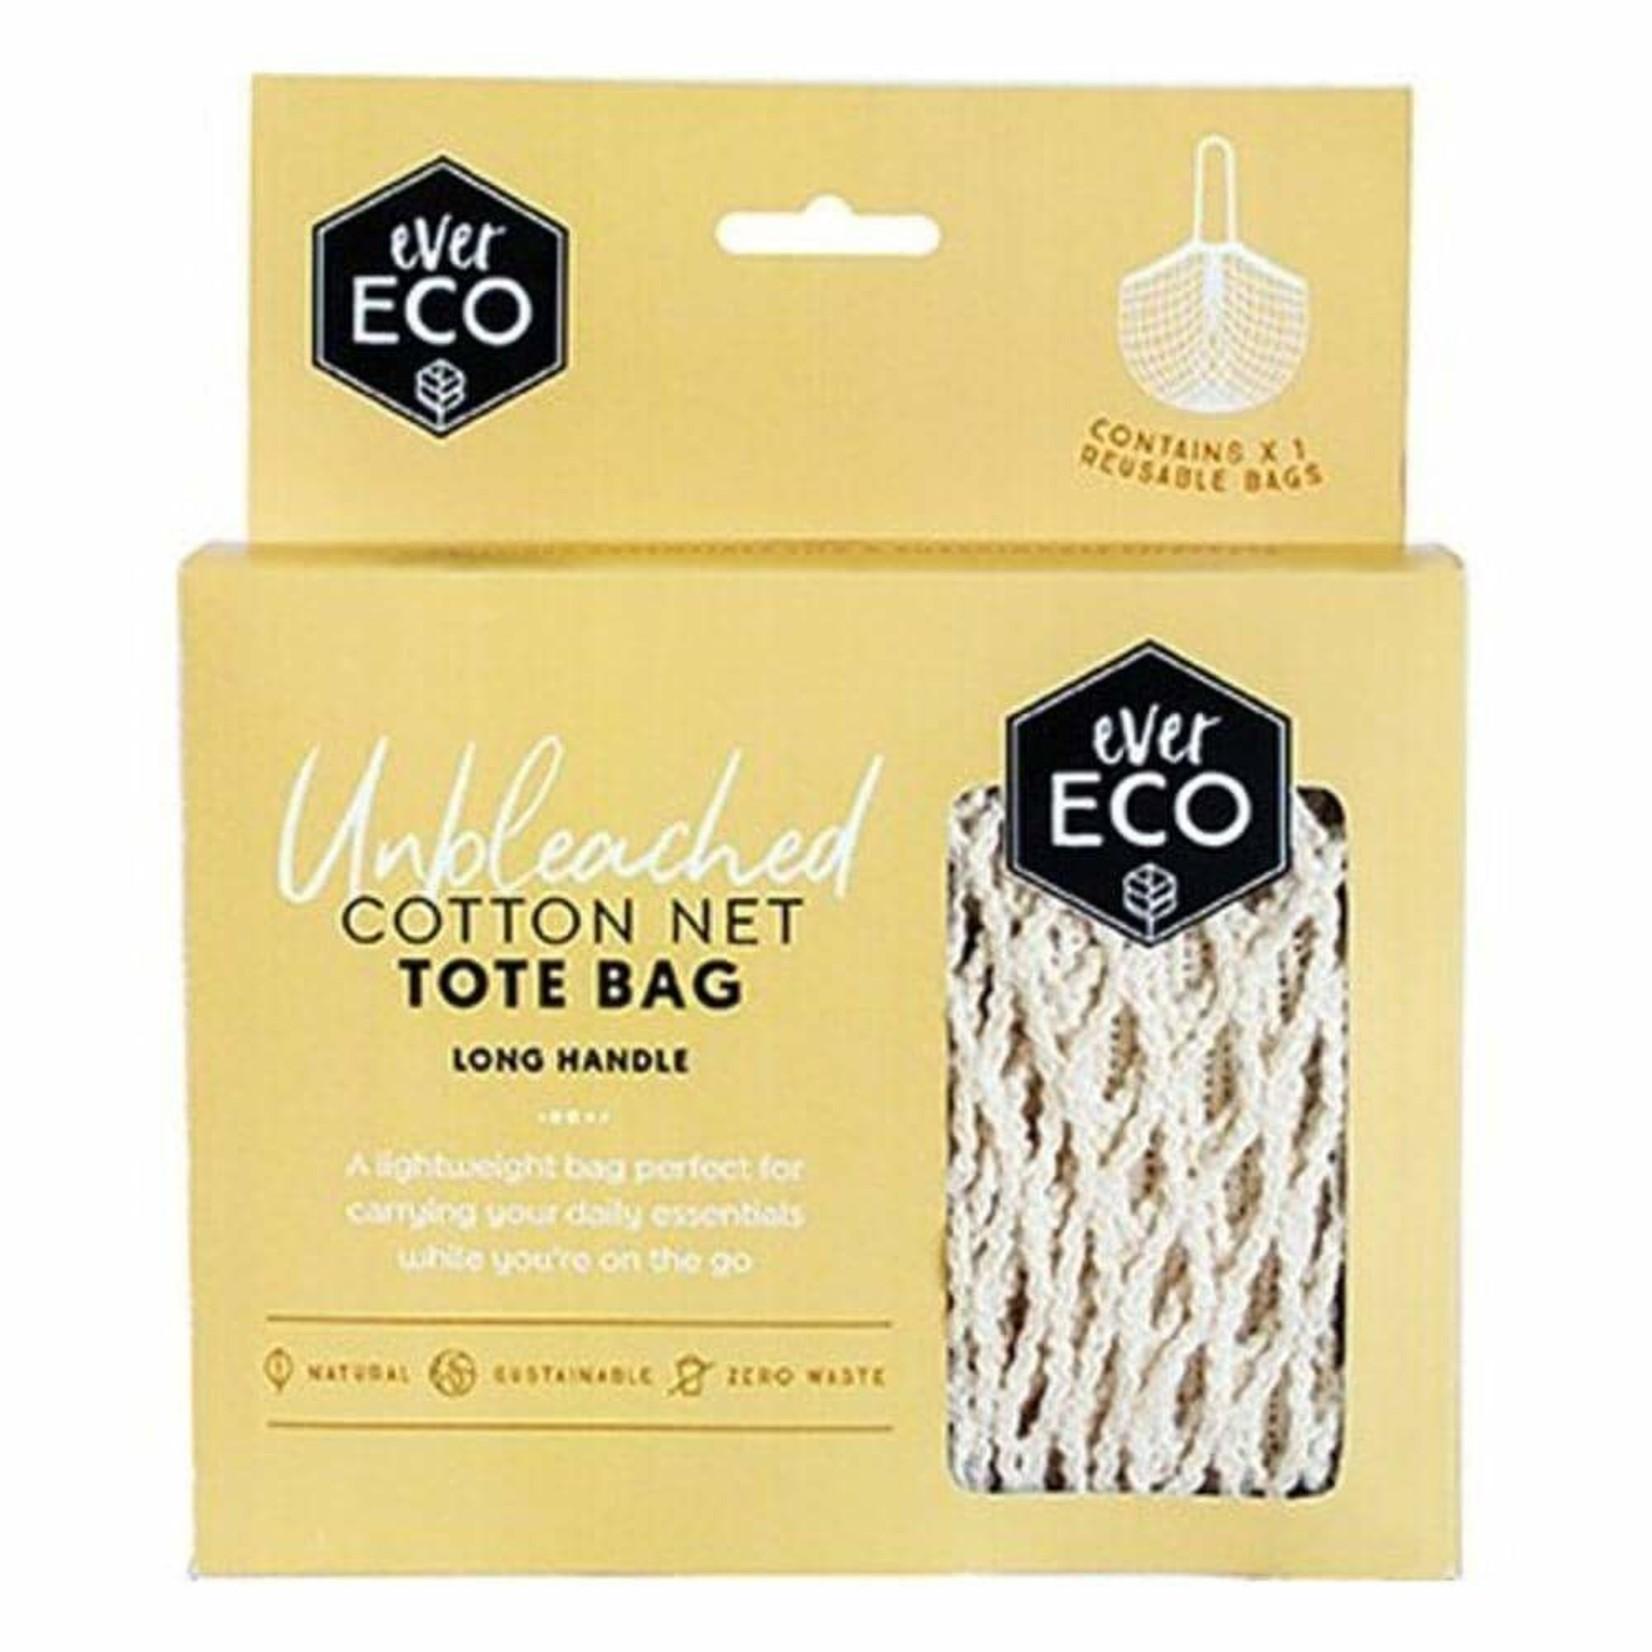 Ever Eco Ever Eco Tote Bag Long Handle